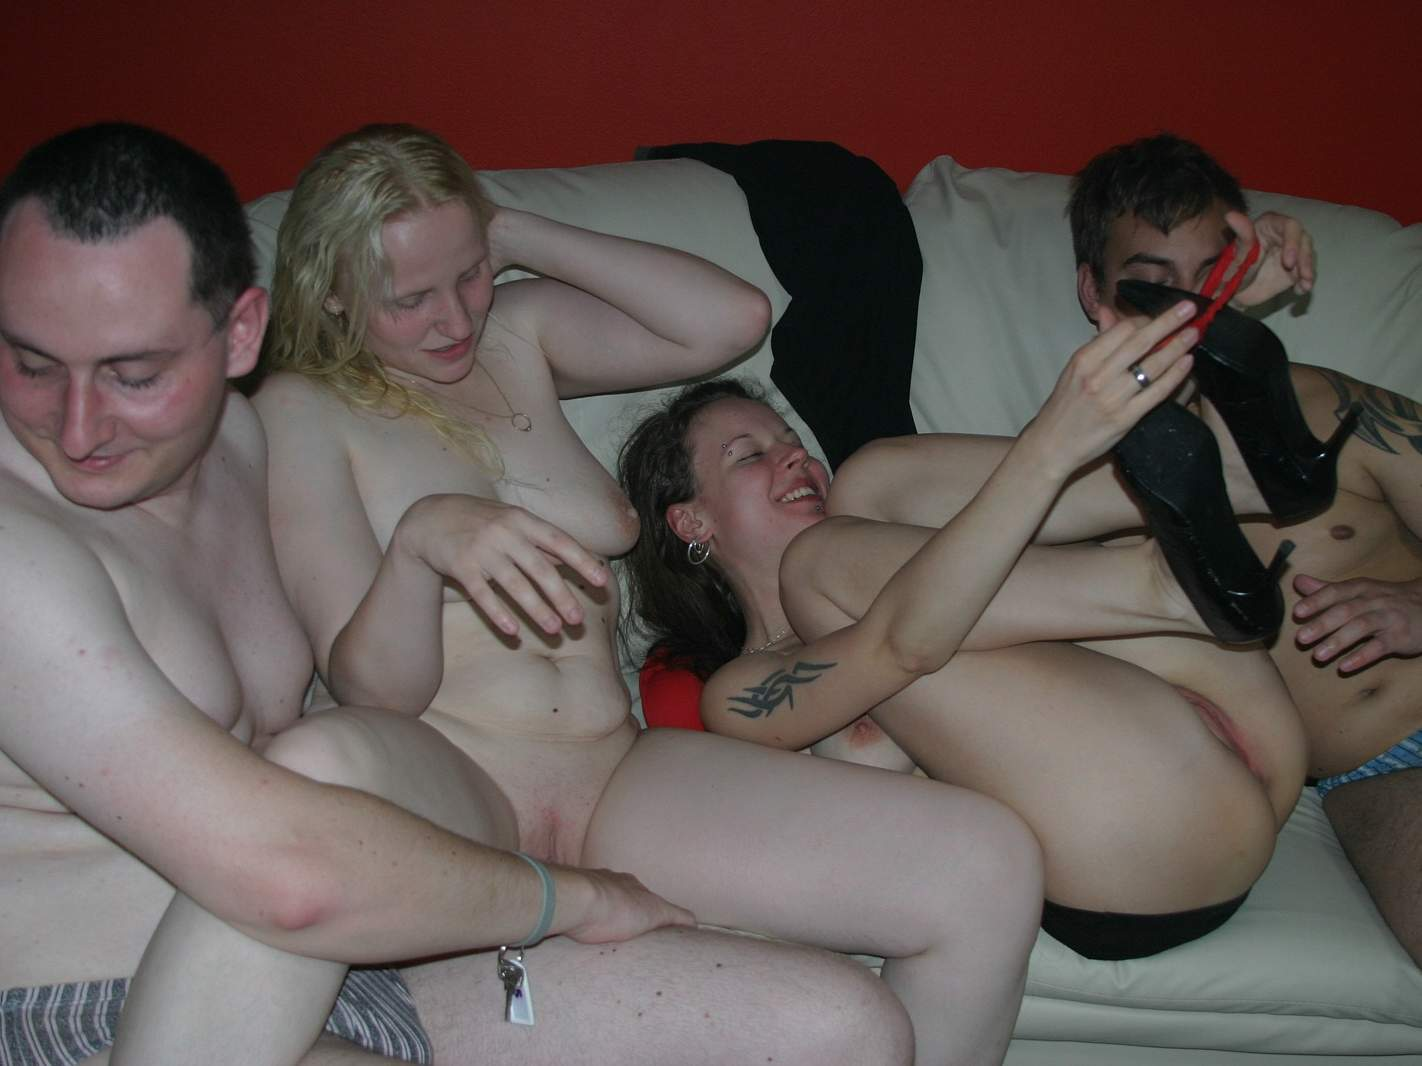 Hot village woman nude